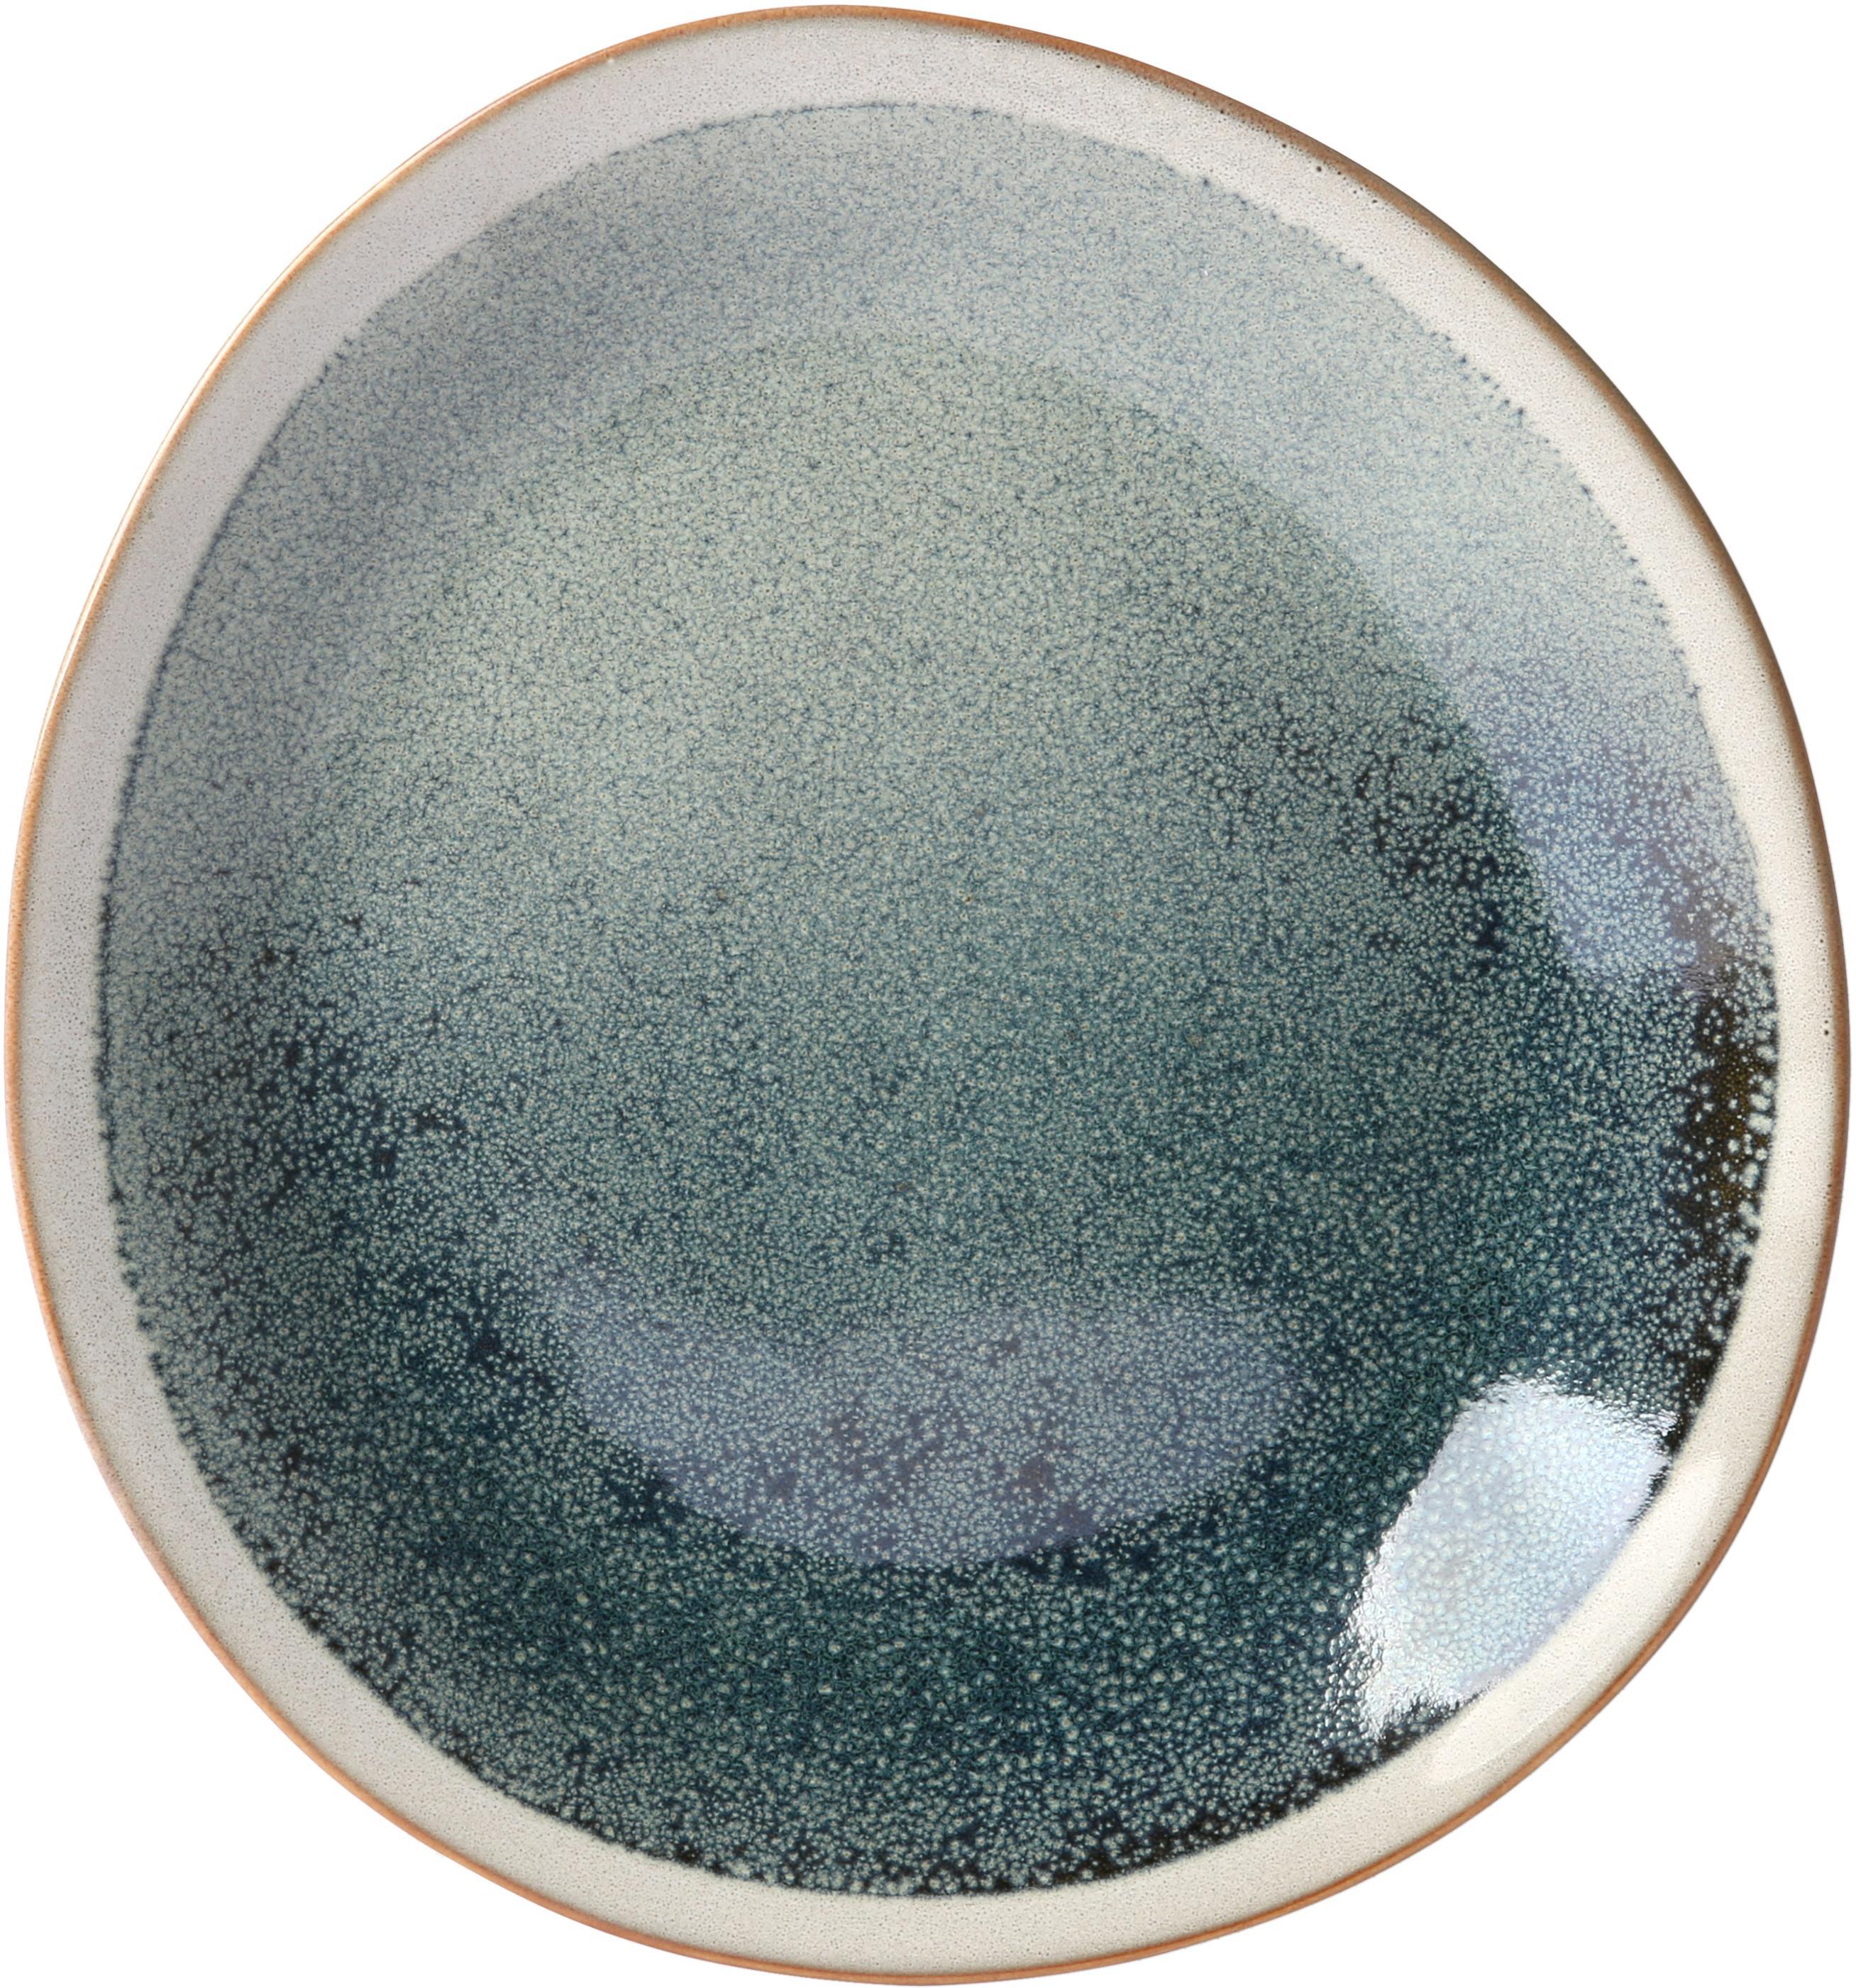 Piattino da dessert artigianale anni '70 2 pz, Ceramica, Verde, crema, Ø 22 cm